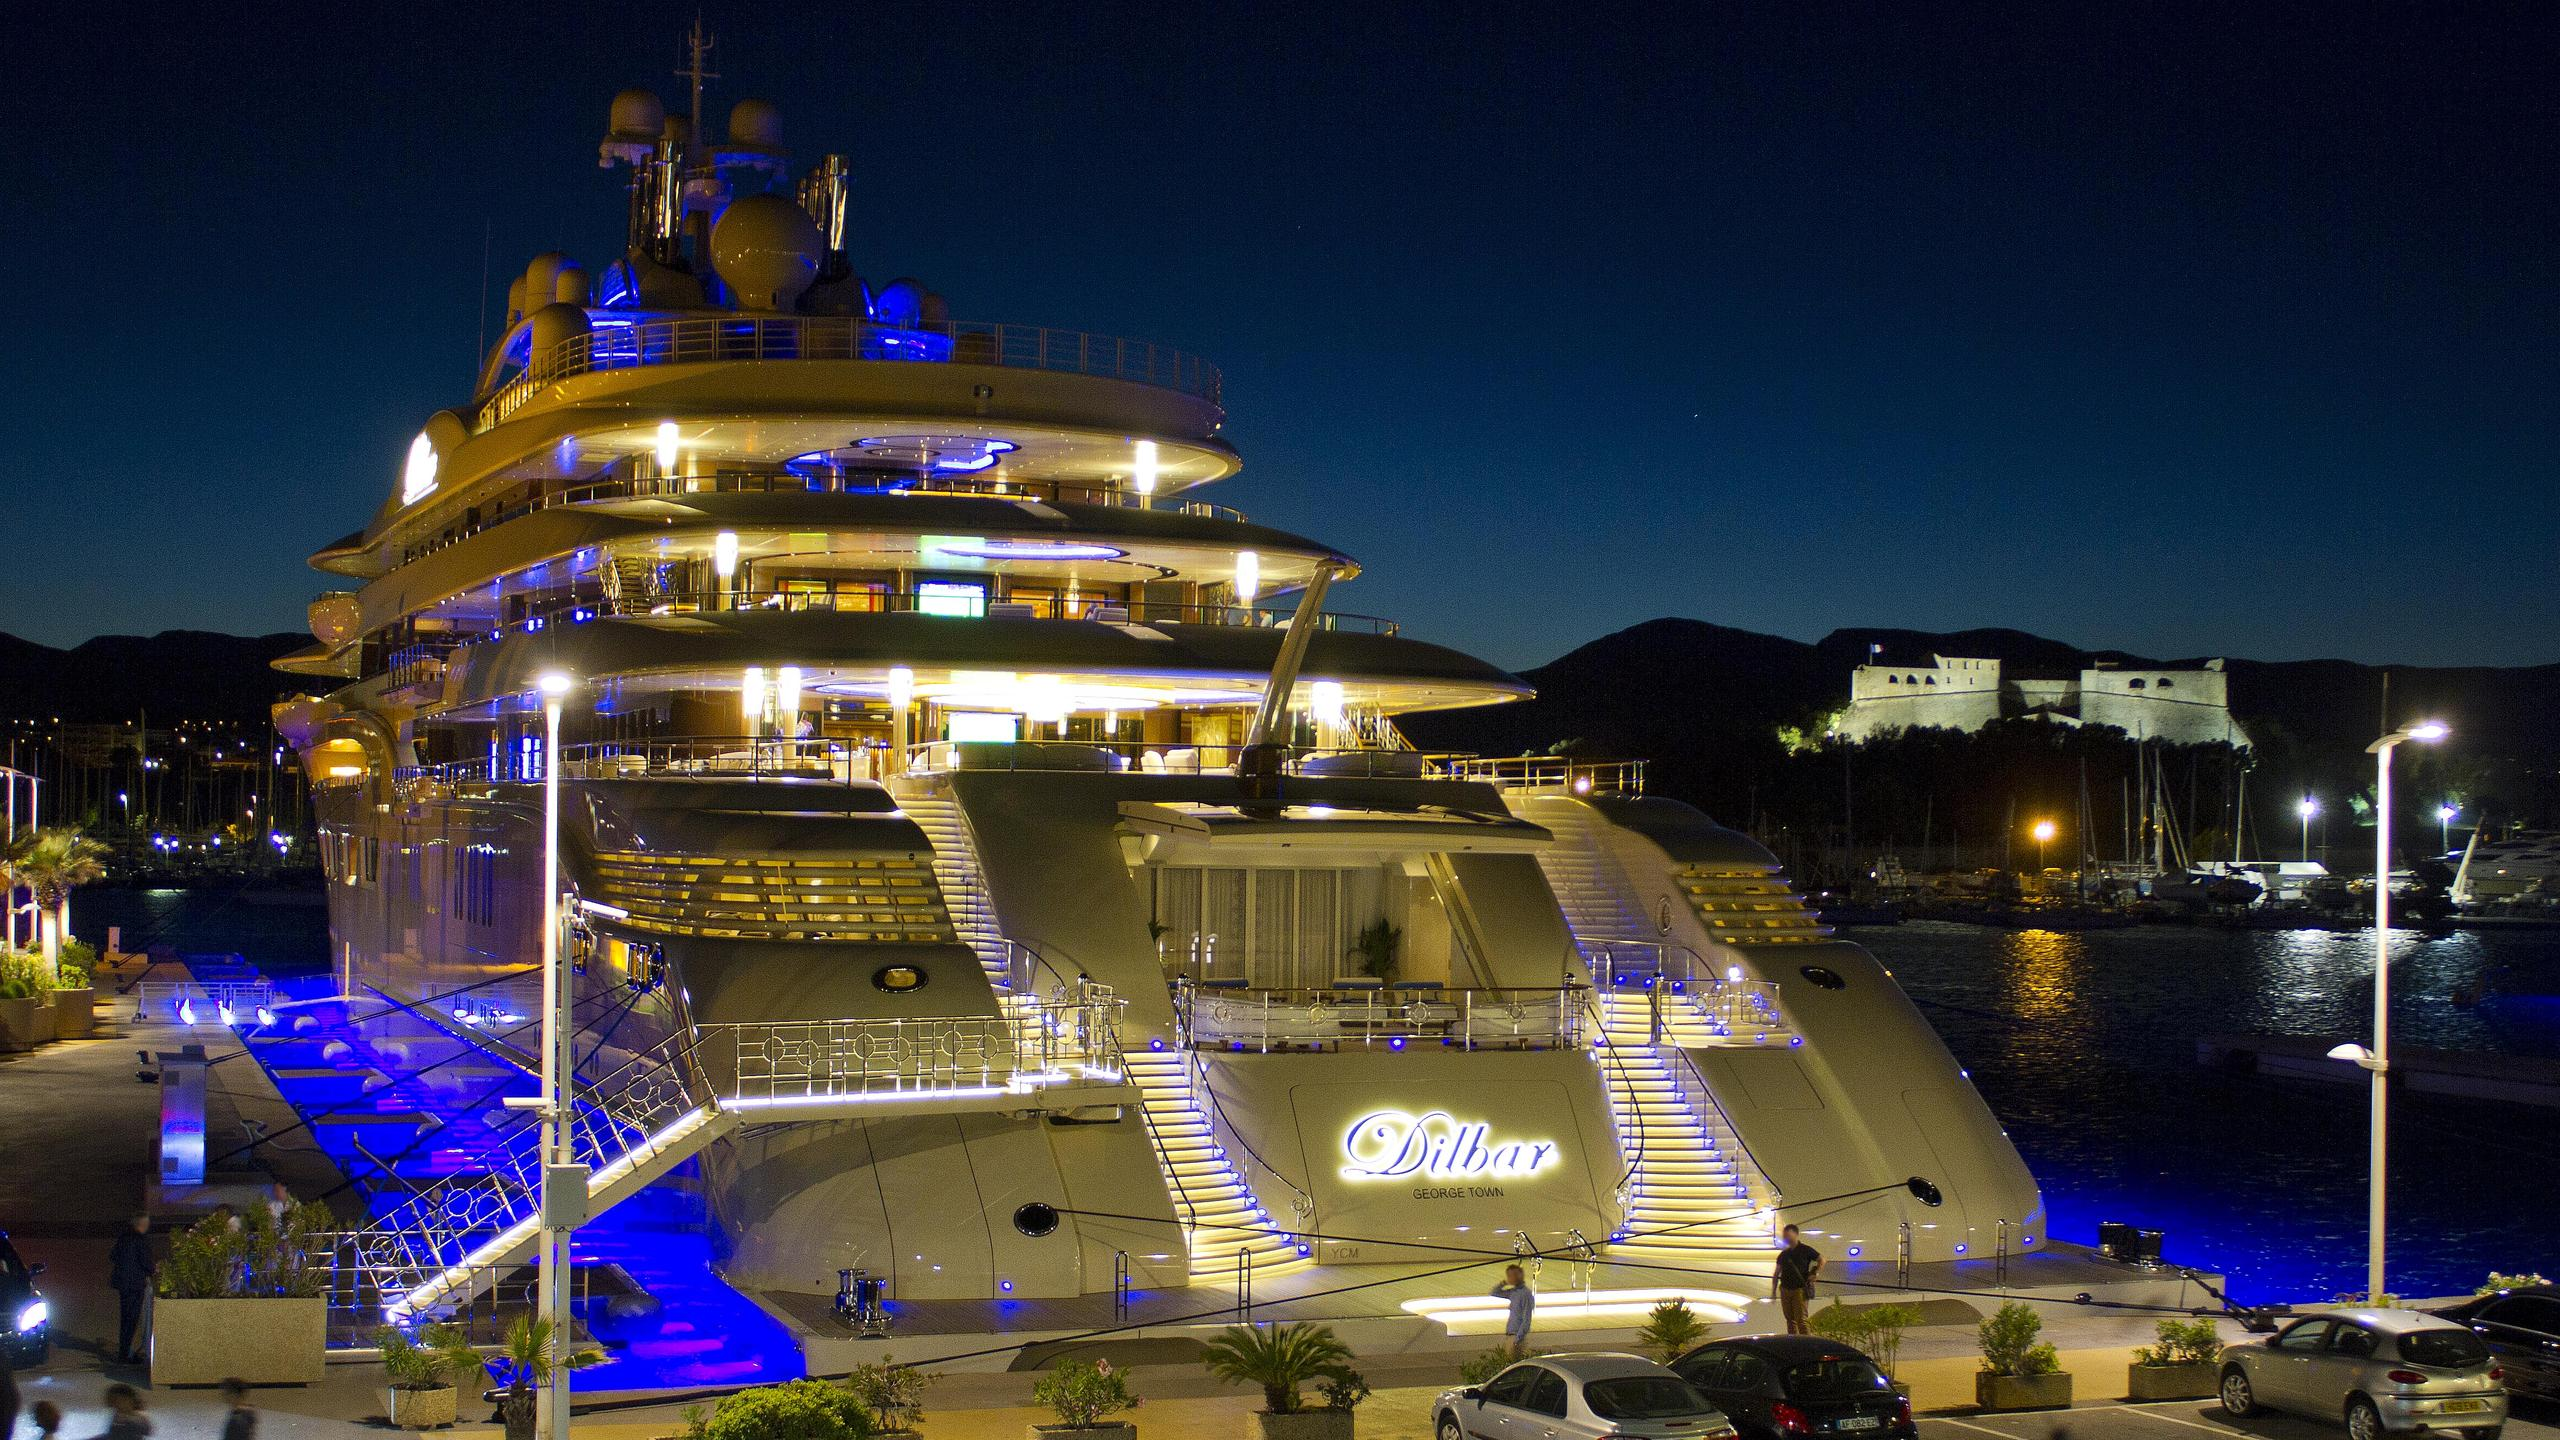 dilbar-motor-yacht-lurssen-2016-156m-stern-by-night